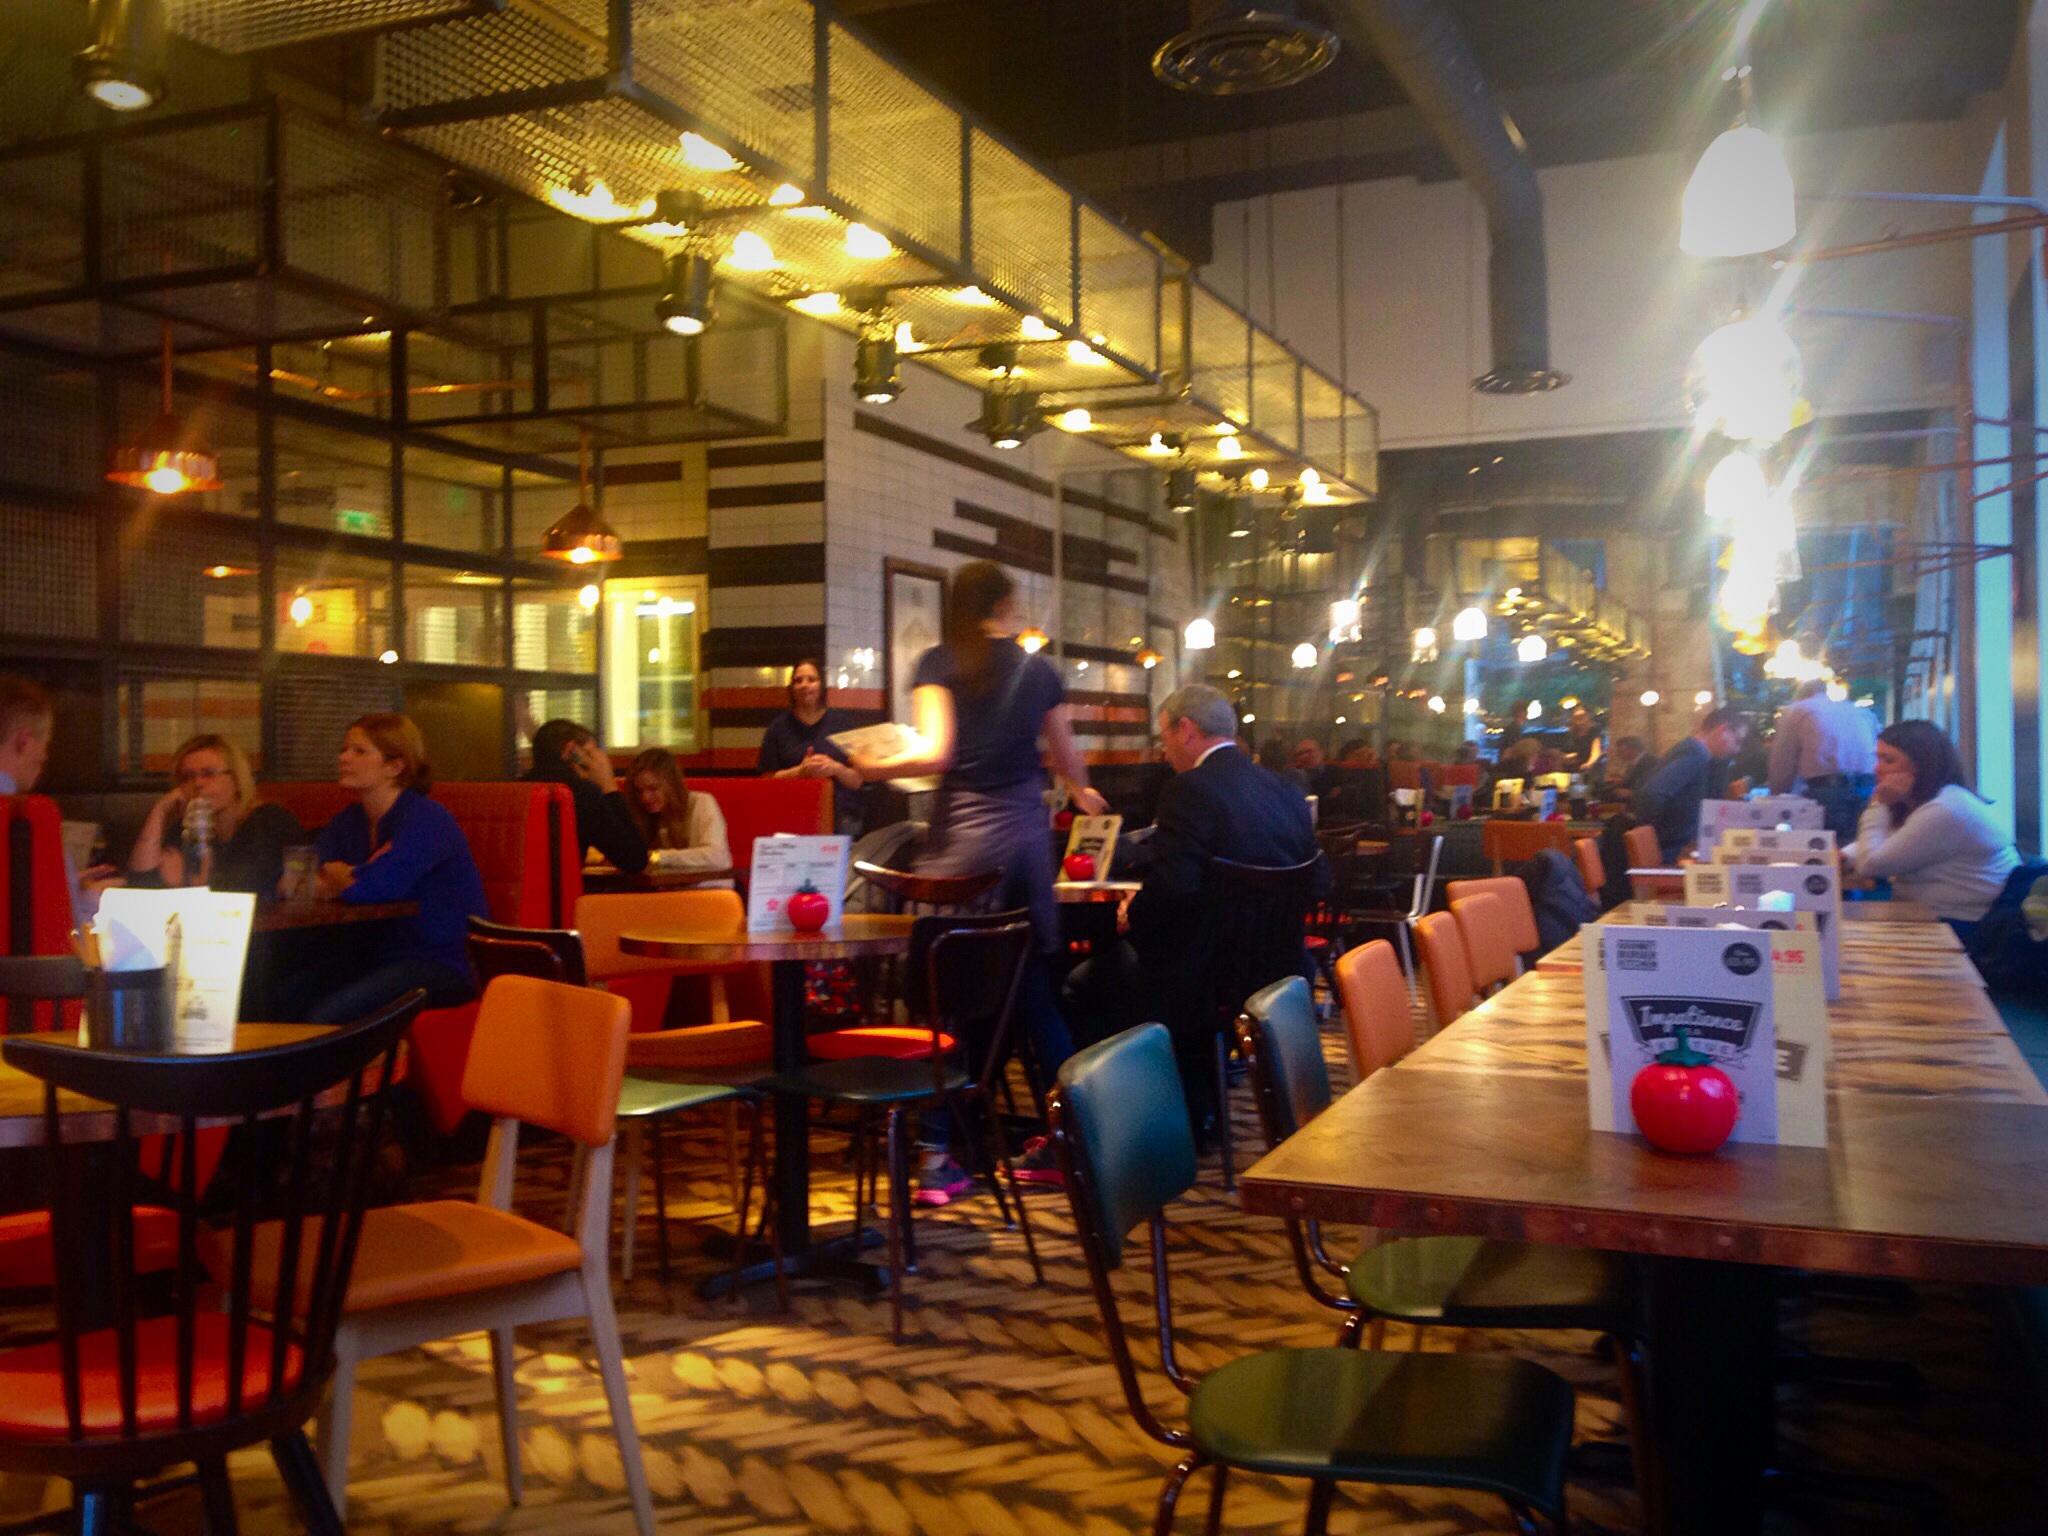 Gourmet burger kitchen Glasgow review